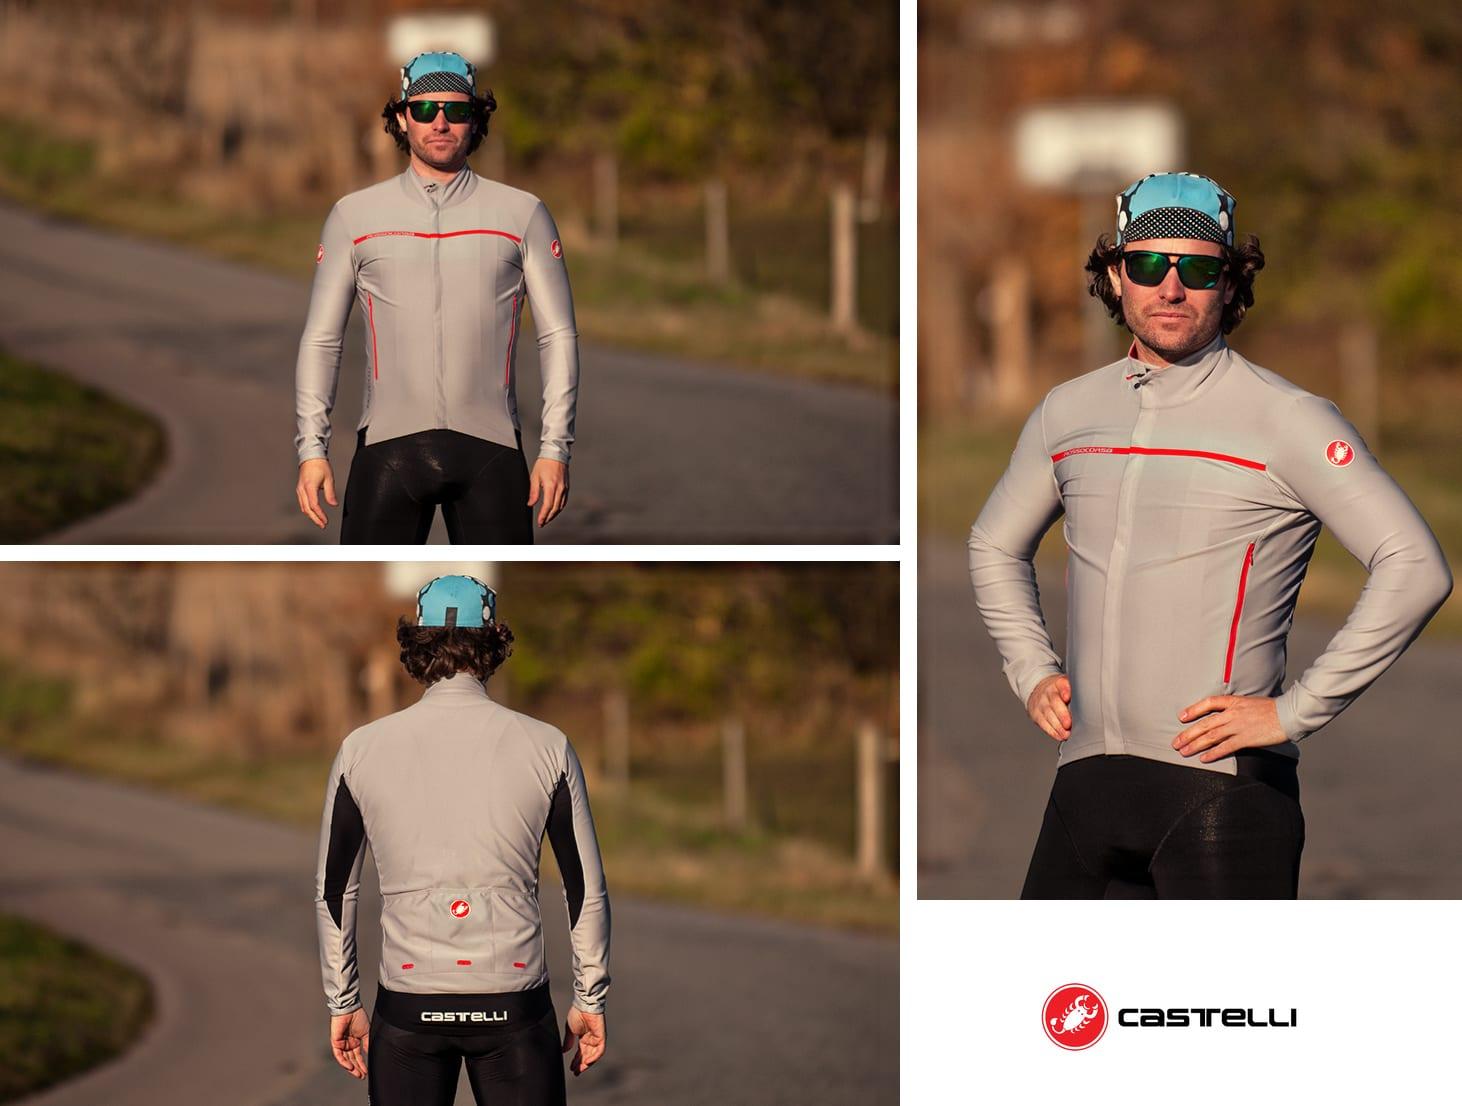 Castelli Jacket Test AltomCykling.dk